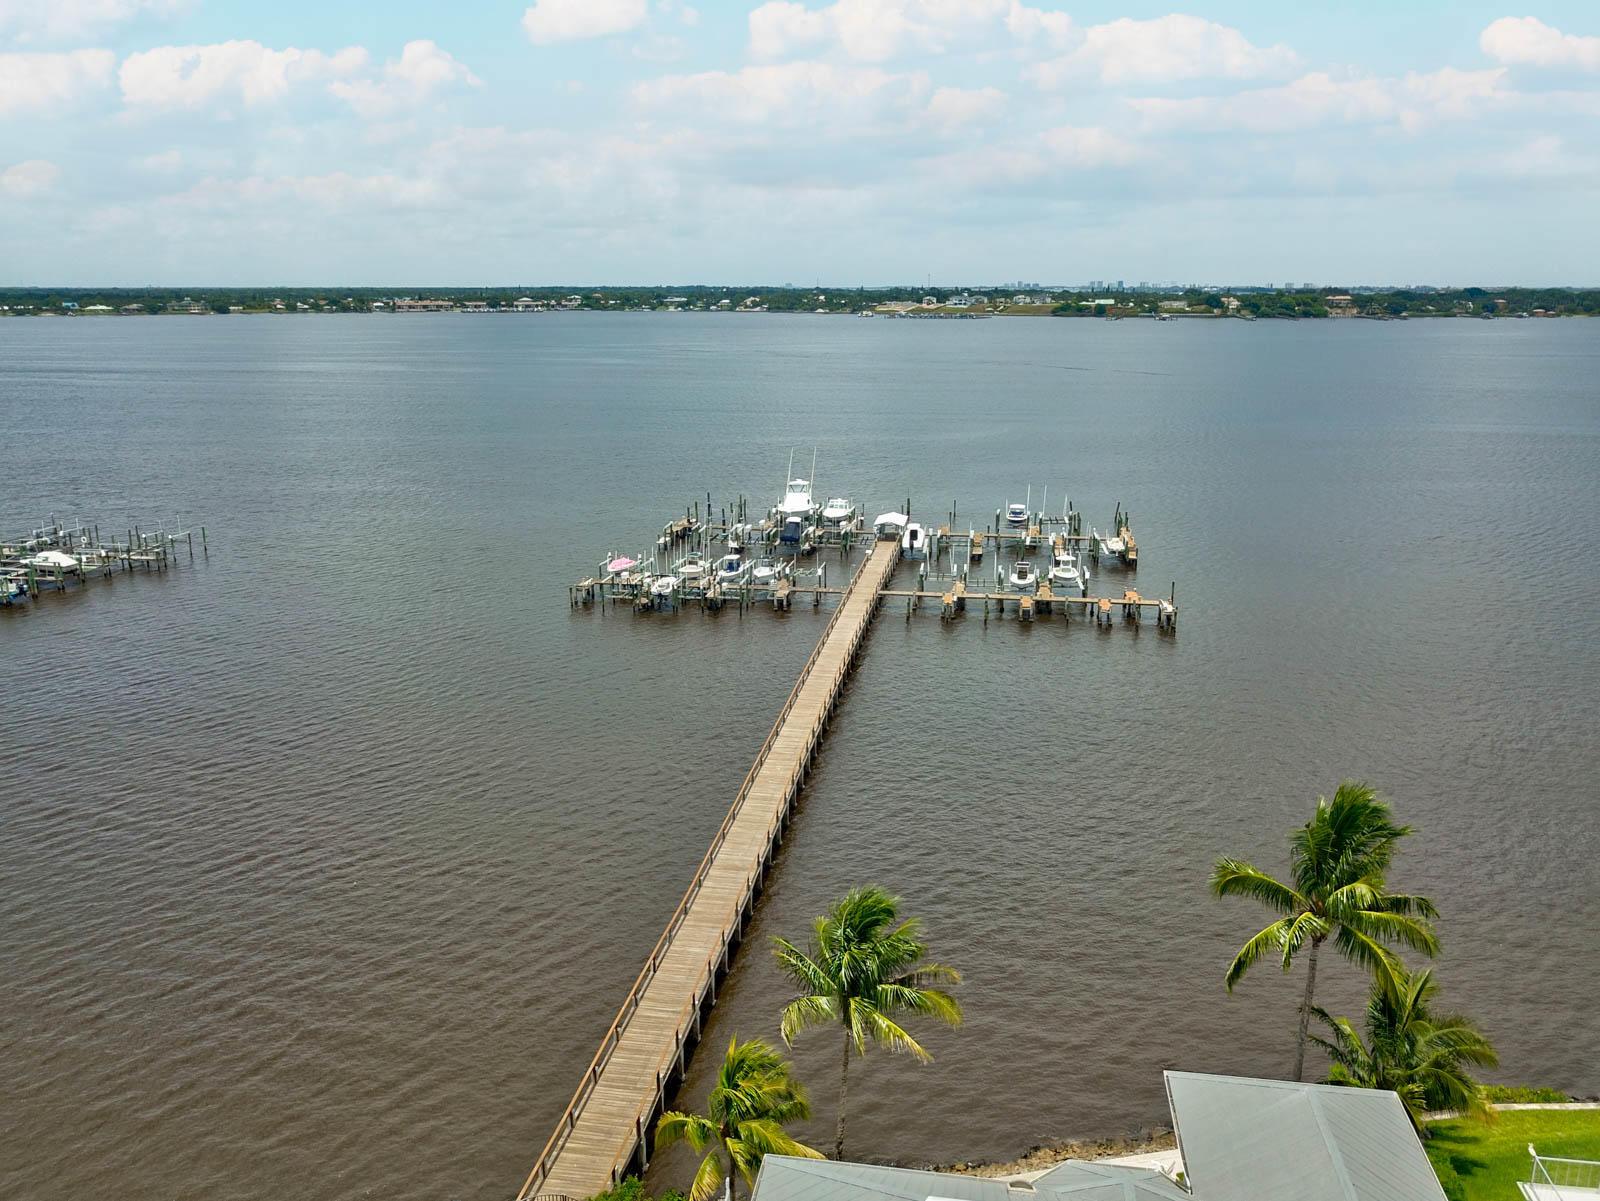 046 - Dock 2 - Four Winds